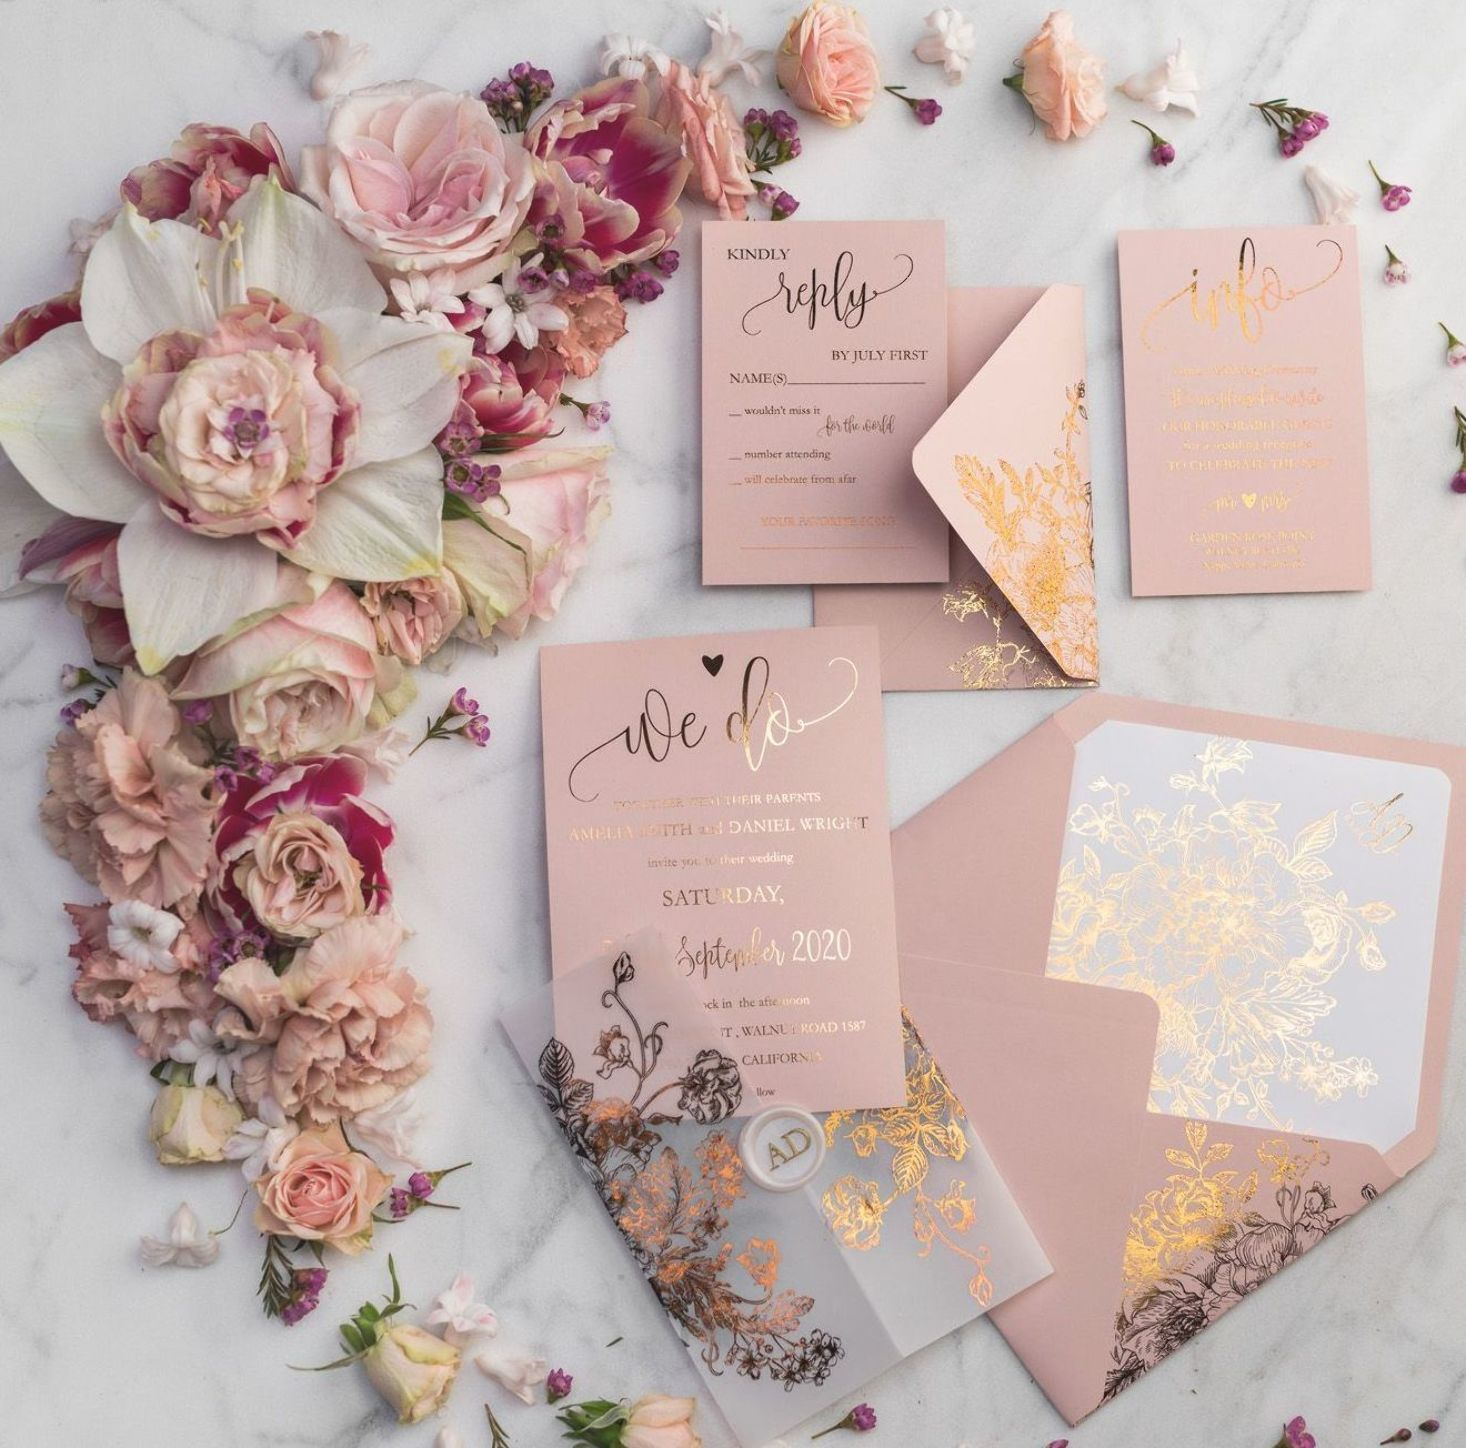 Custom Wedding Invitations Gold Foil Printing 02 Goldkalw Z Gold Wedding Invitations Polka Dot Wedding Invites Wedding Invitations